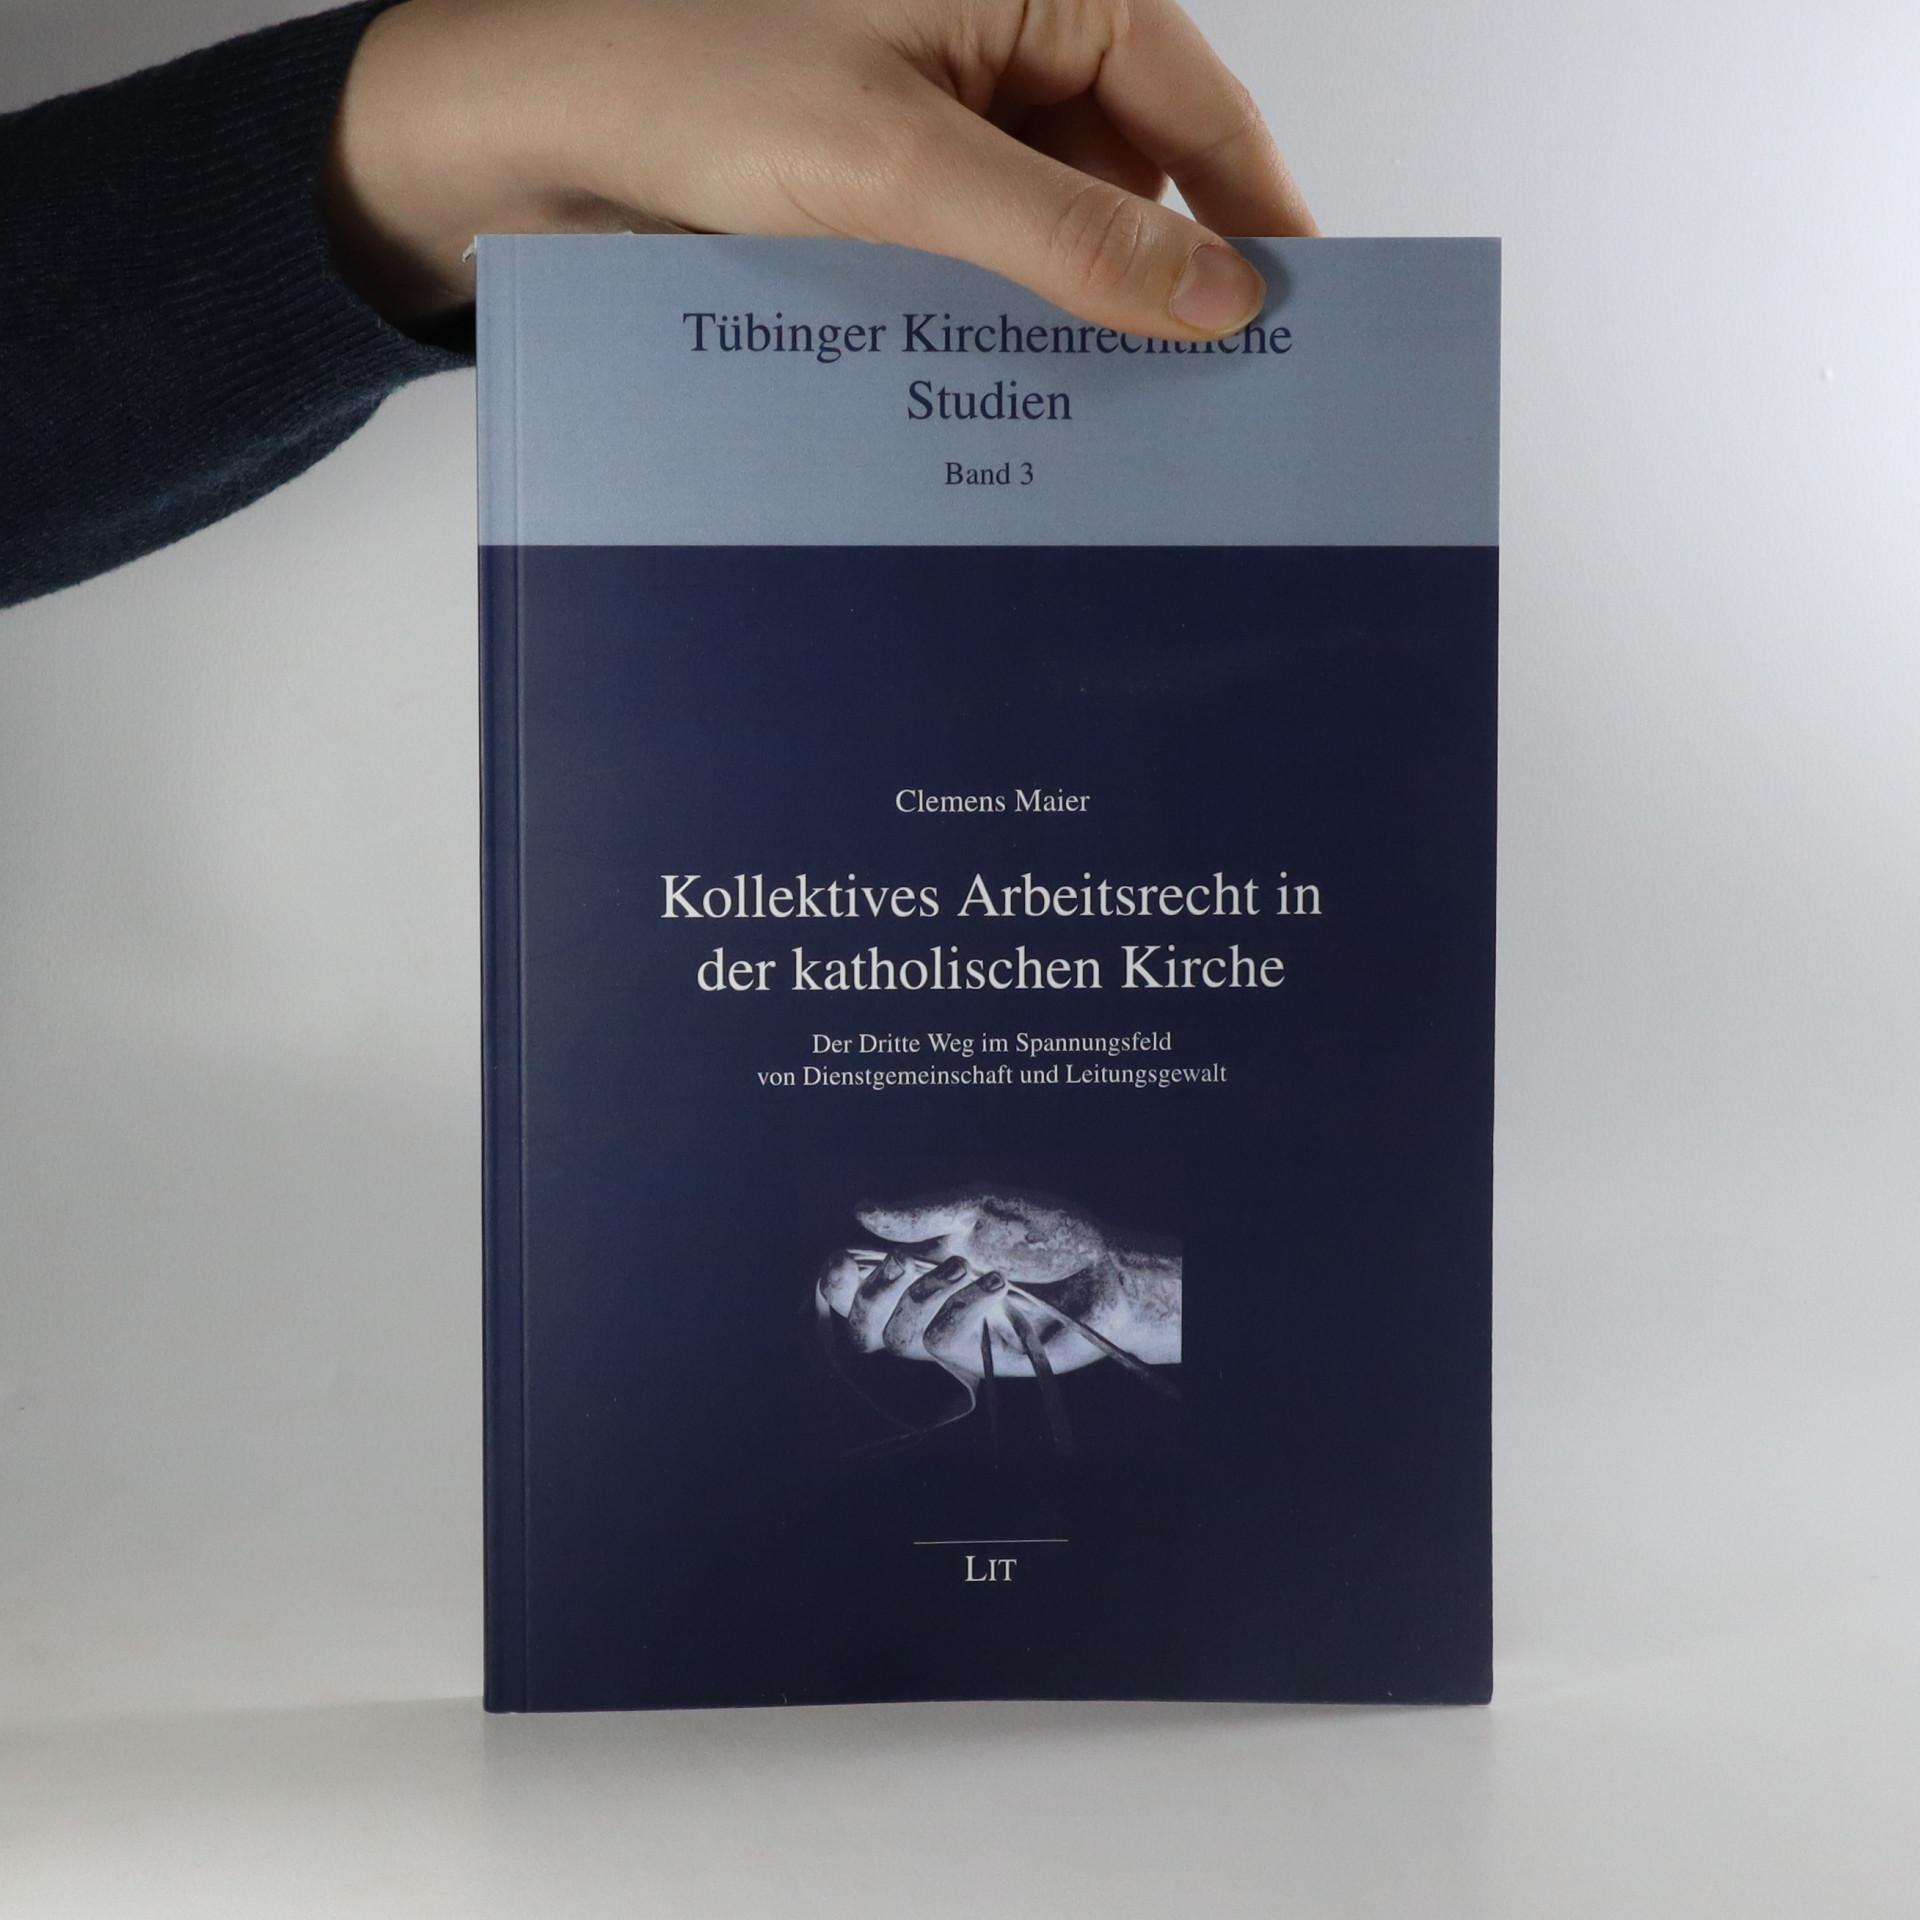 antikvární kniha Kollektives Arbeitsrecht in der katholischen Kirche, neuveden